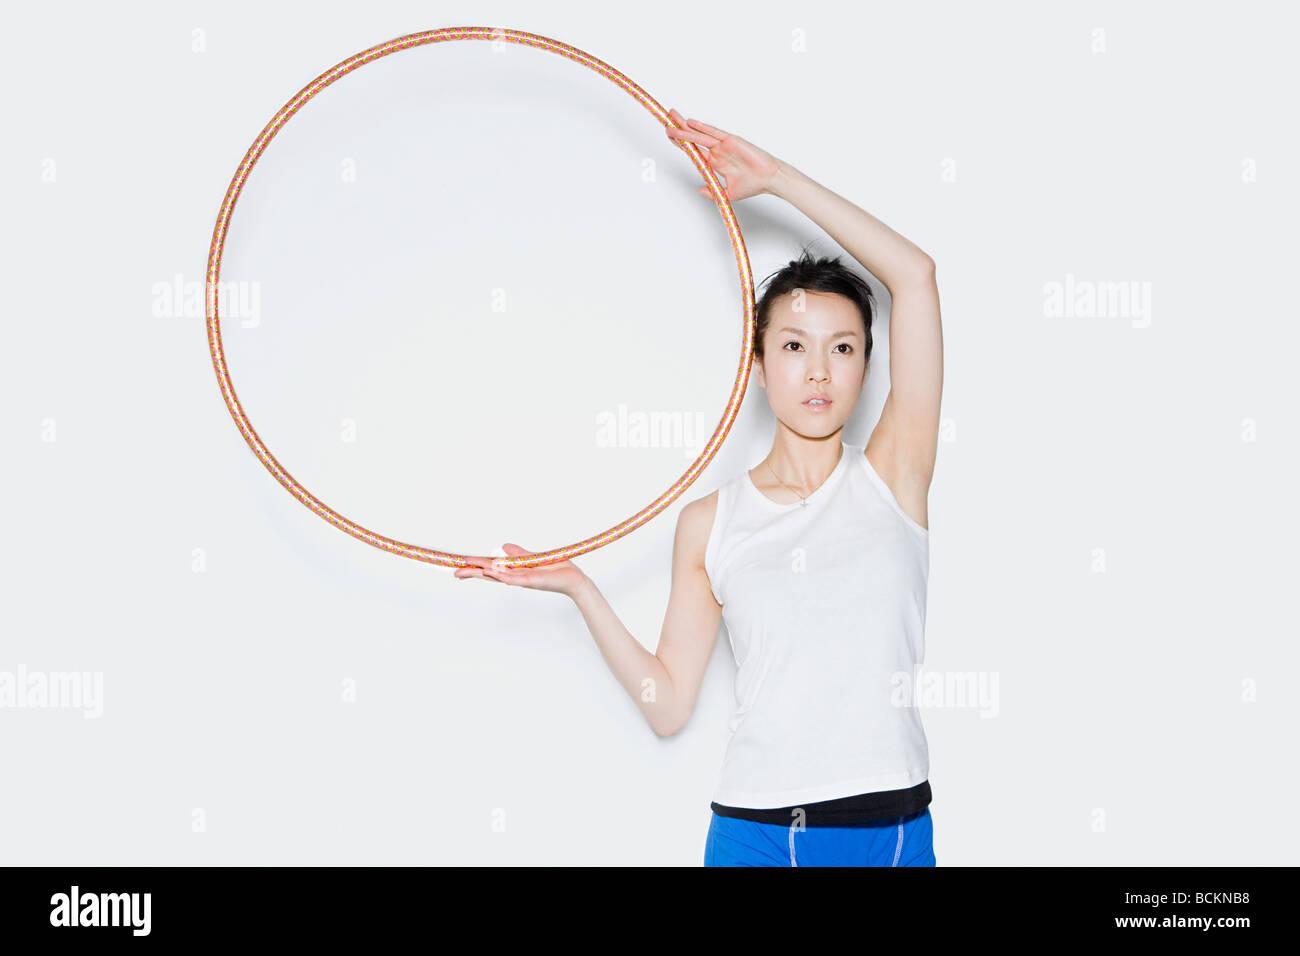 Woman holding hoop Stock Photo